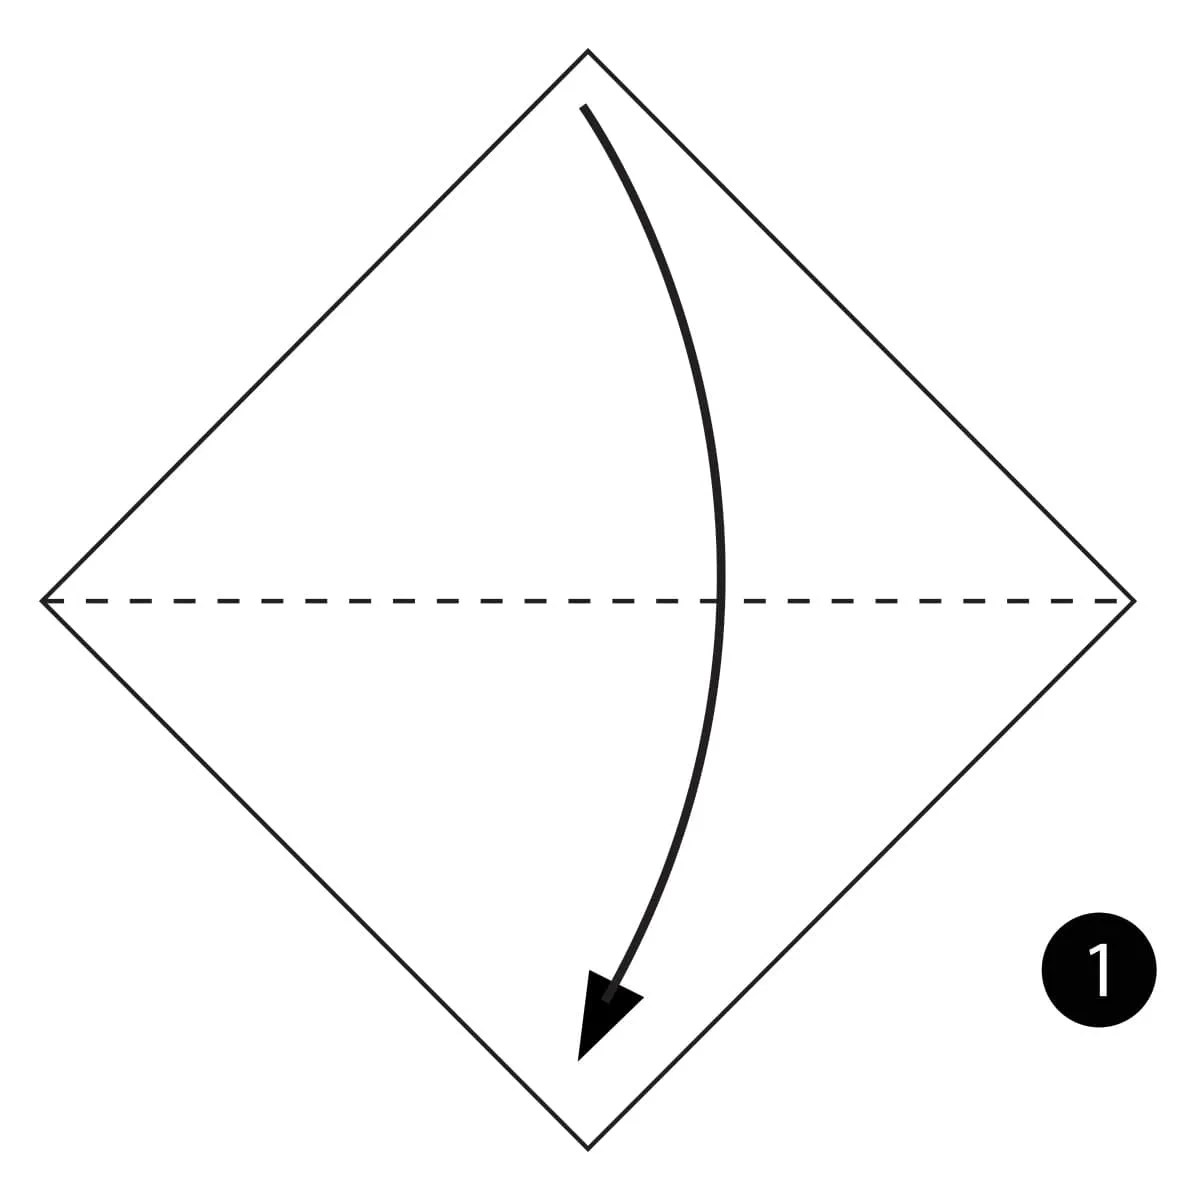 hight resolution of easy samurai diagram wiring diagram easy samurai diagram